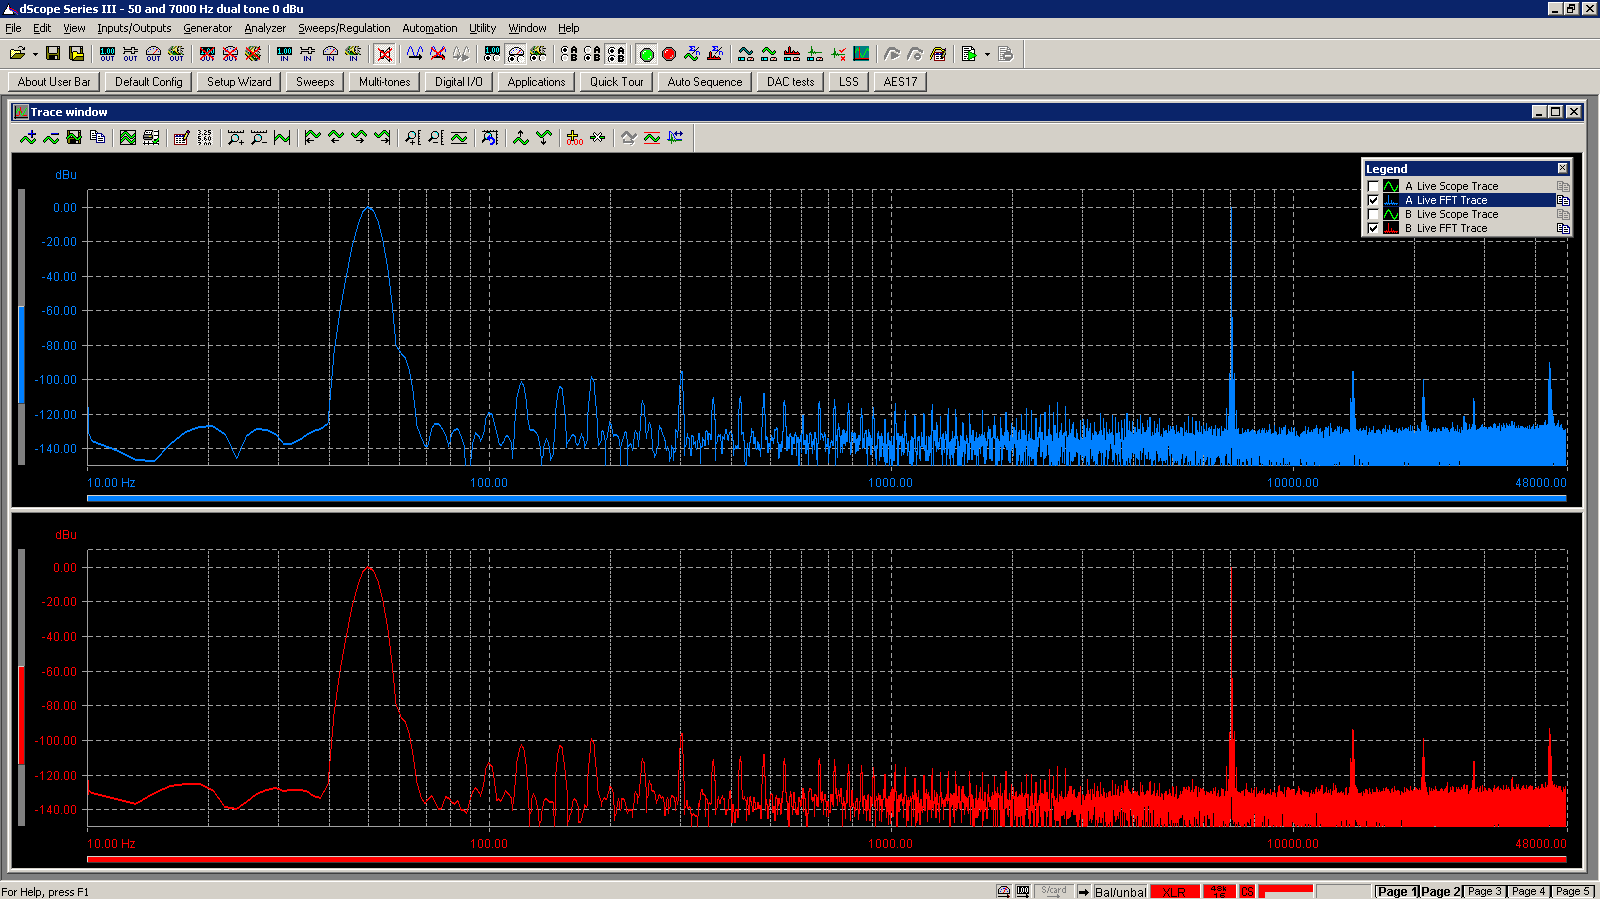 20160905 Jotunheim 50+7000Hz dual tone 0dBu 30R unBal.png